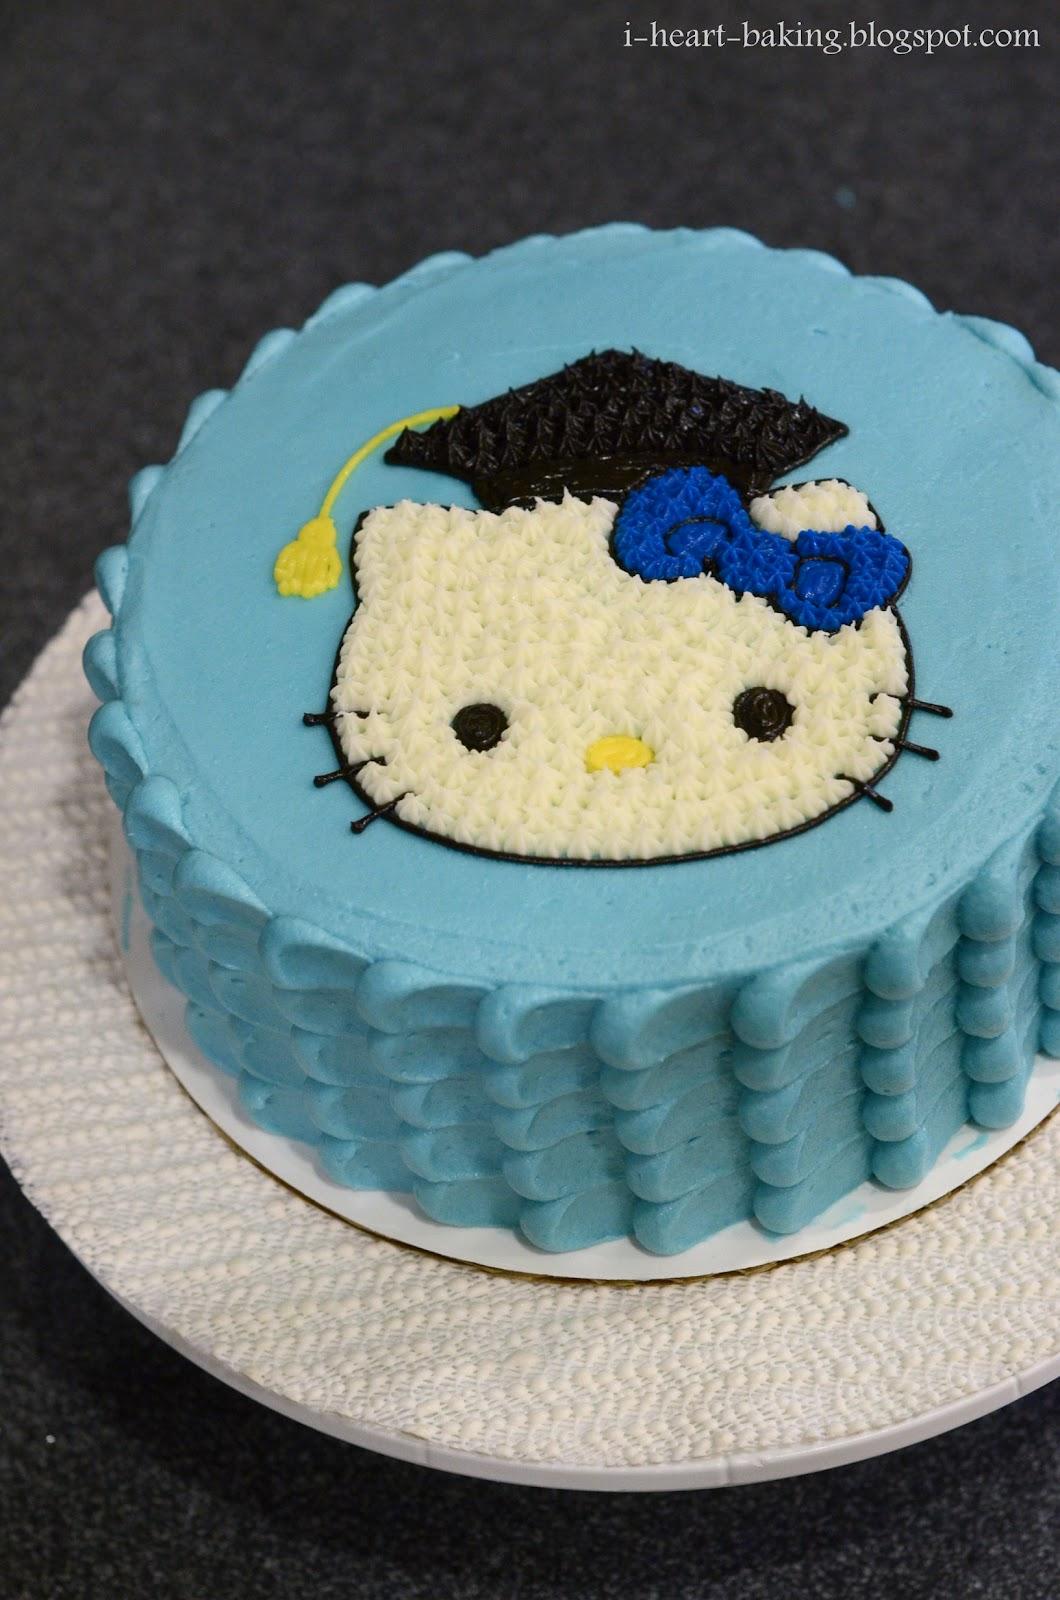 Cake Hello Kitty Blue : i heart baking!: August 2012